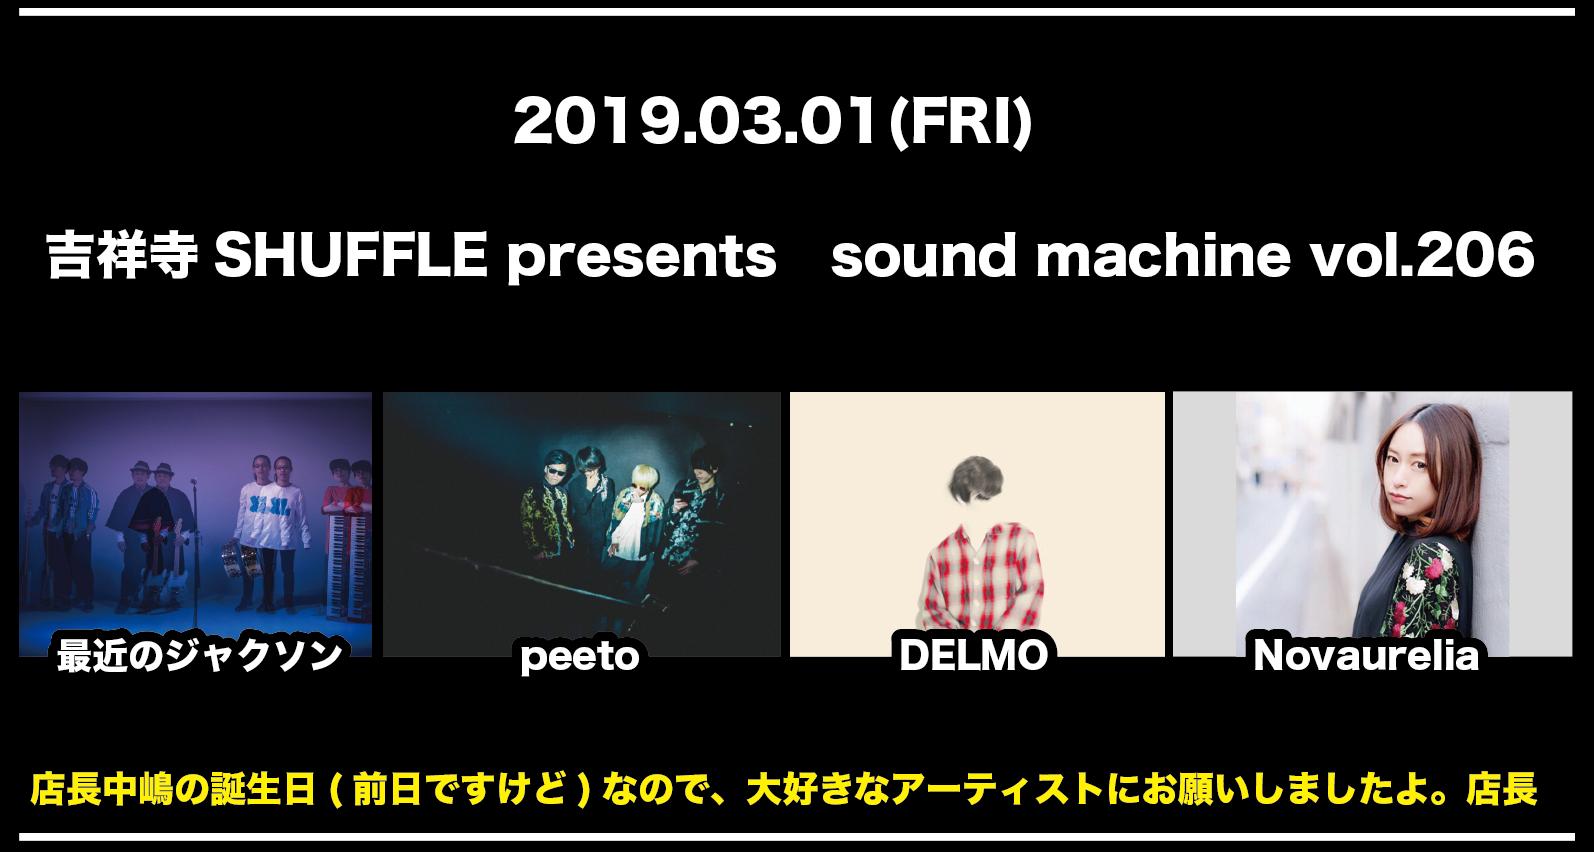 吉祥寺SHUFFLE presents sound machine vol.206